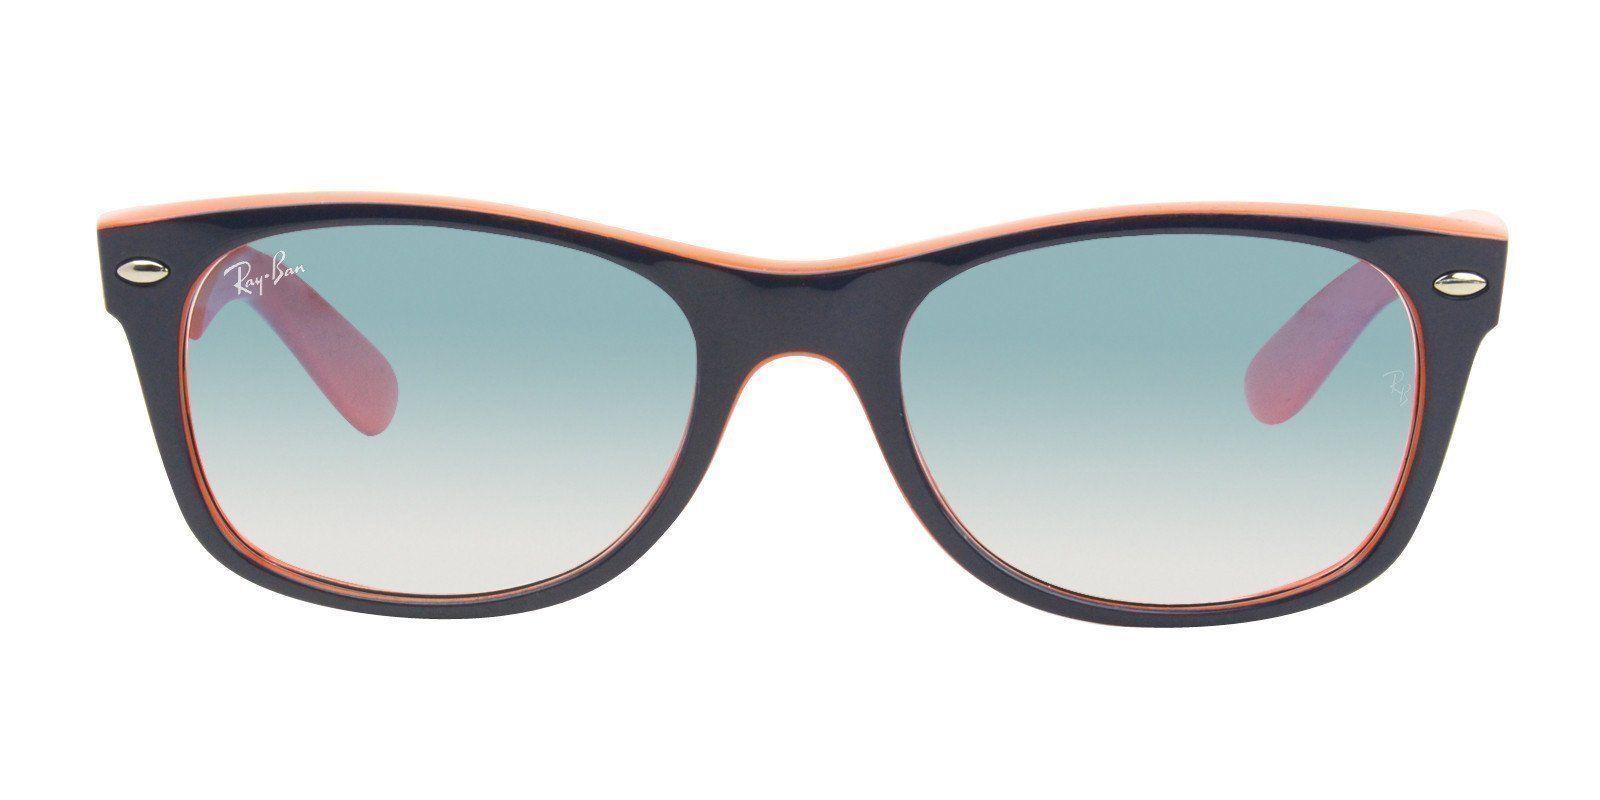 98967c795c Ray Ban - New Wayfarer Blue - Blue sunglasses– Designer Eyes